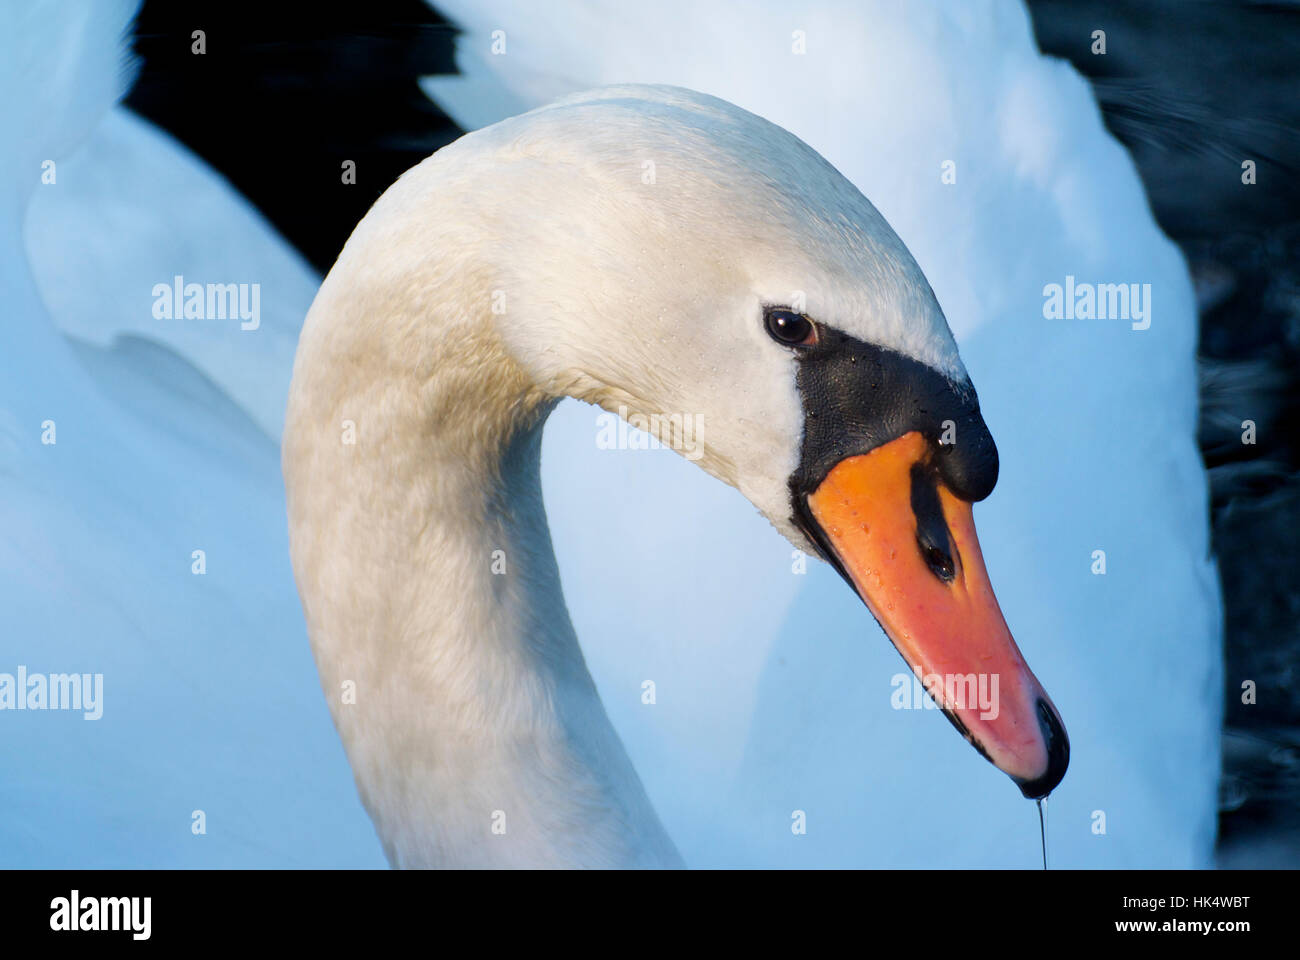 Mute swan (cygnus olor) in soft light - Stock Image